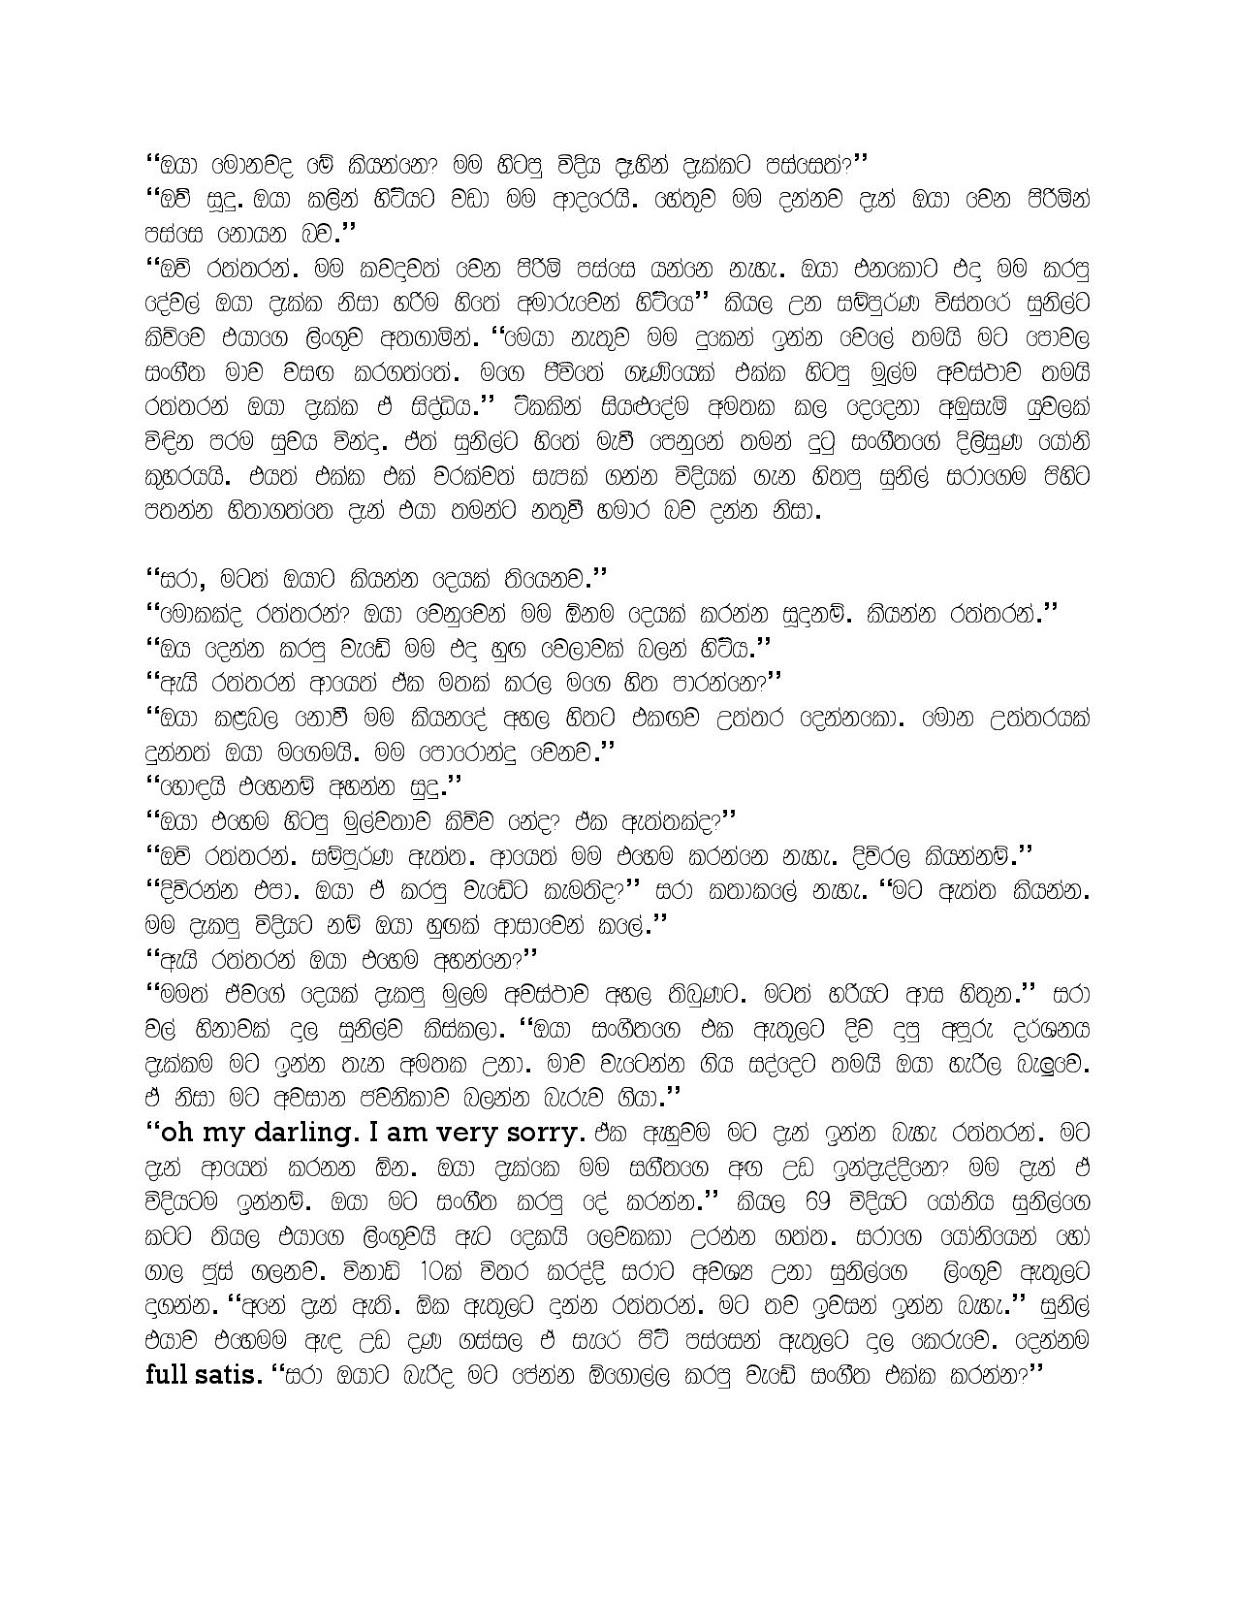 response to mahaththaya nethi davasata